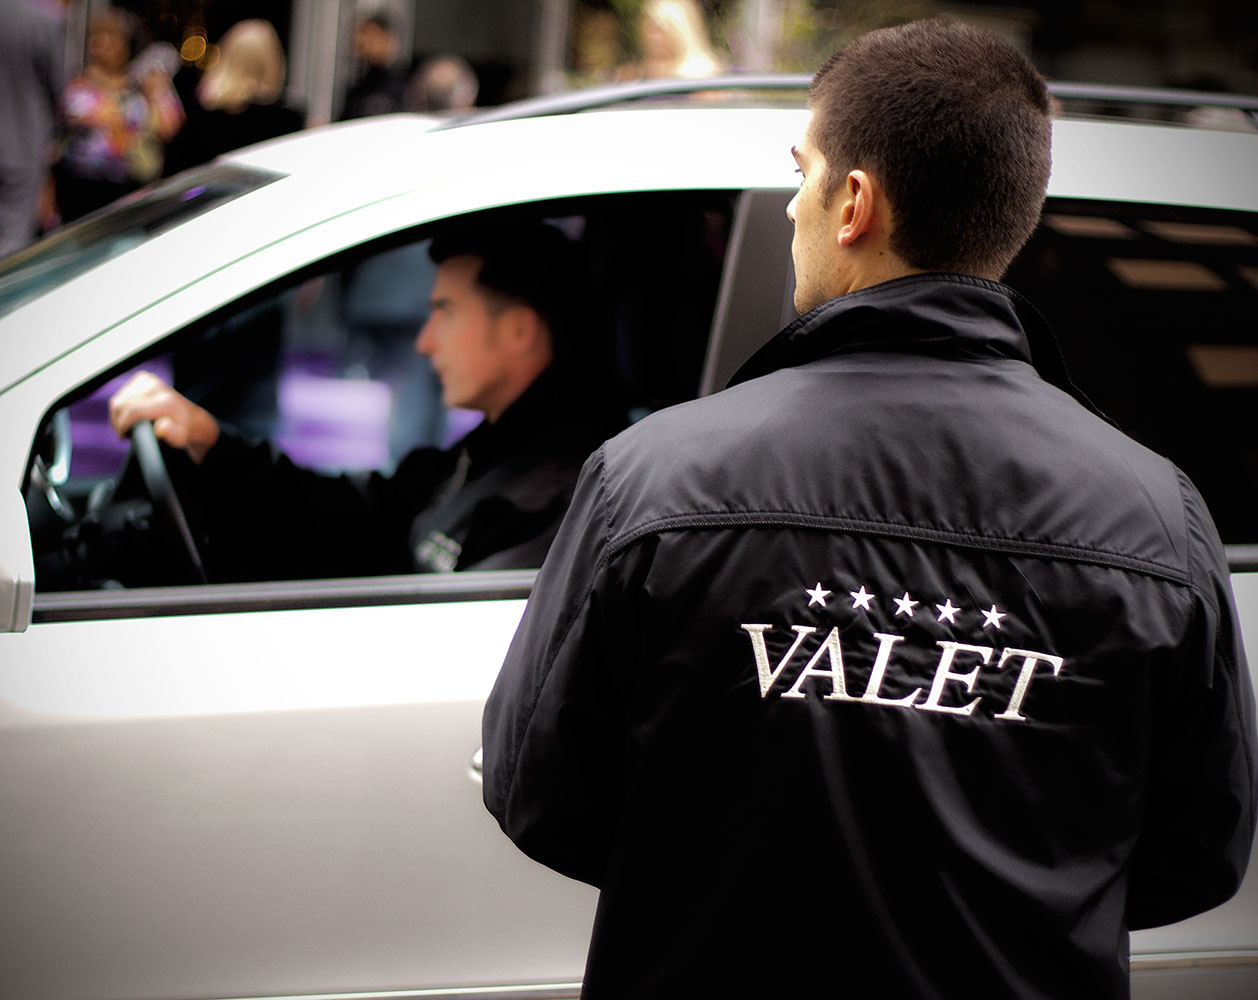 Valet Parking Is Lbp5 000 Not A Cent More